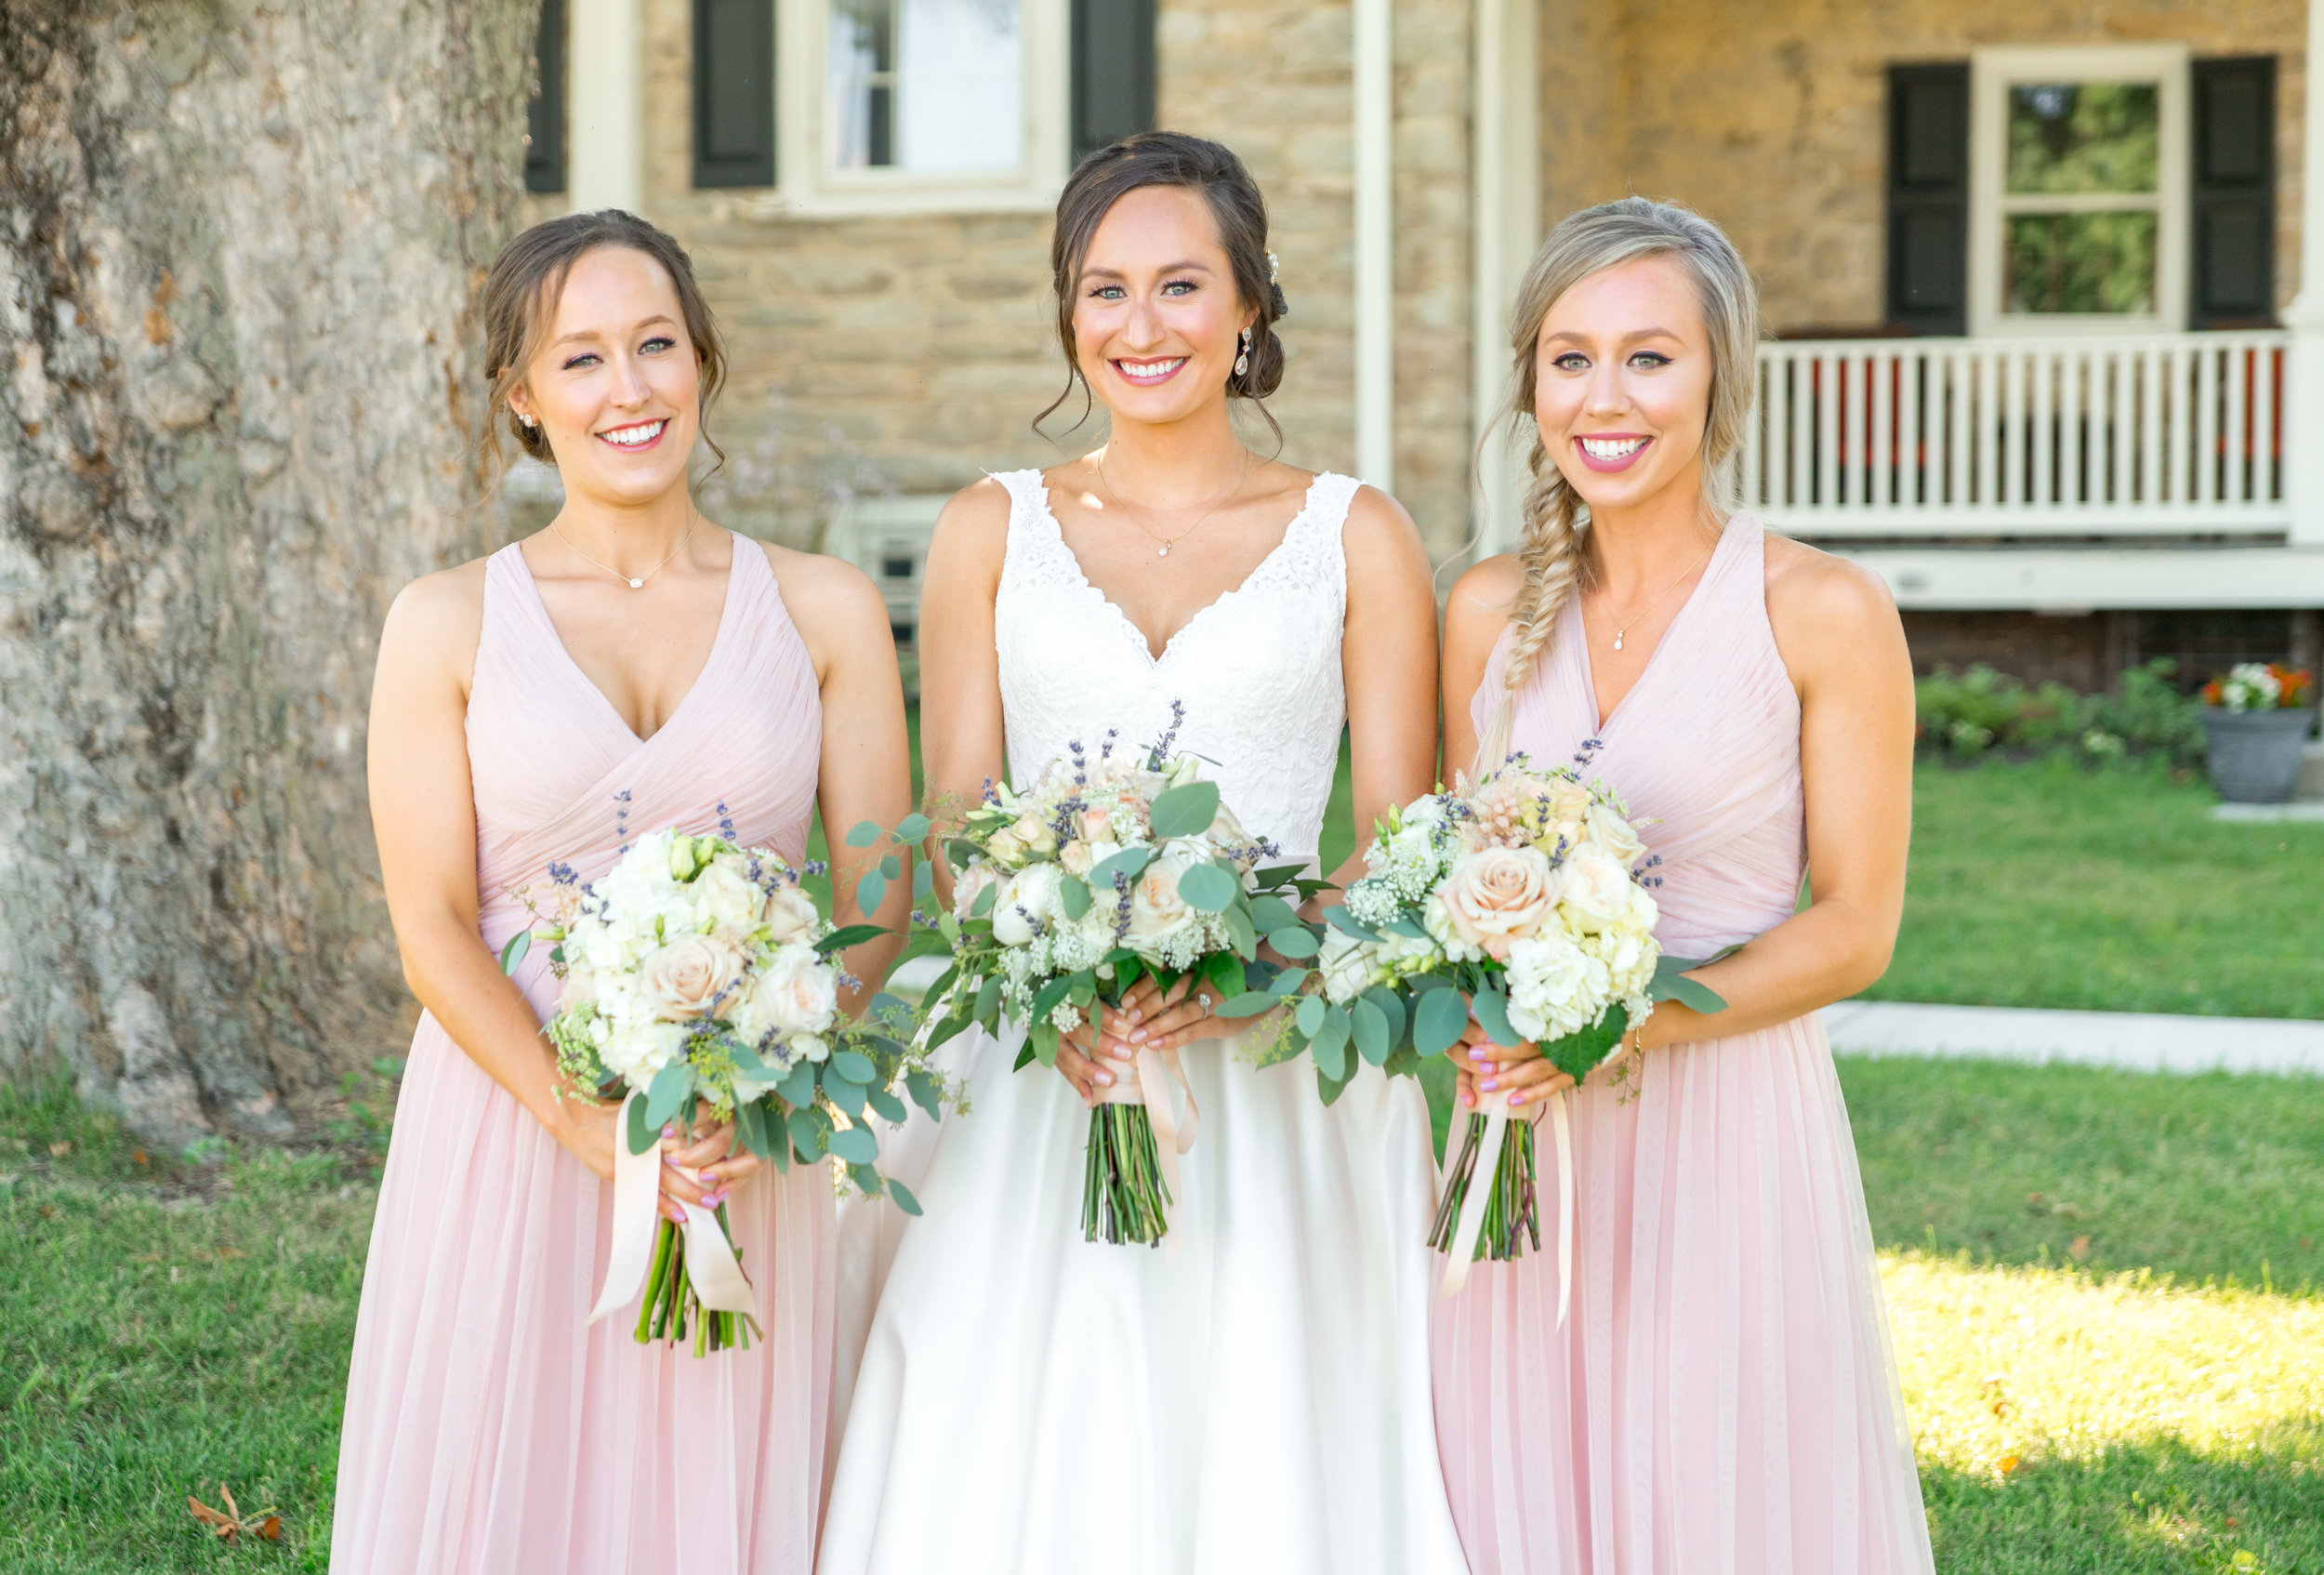 Pink bridesmaids dresses at Springfield Manor Winery